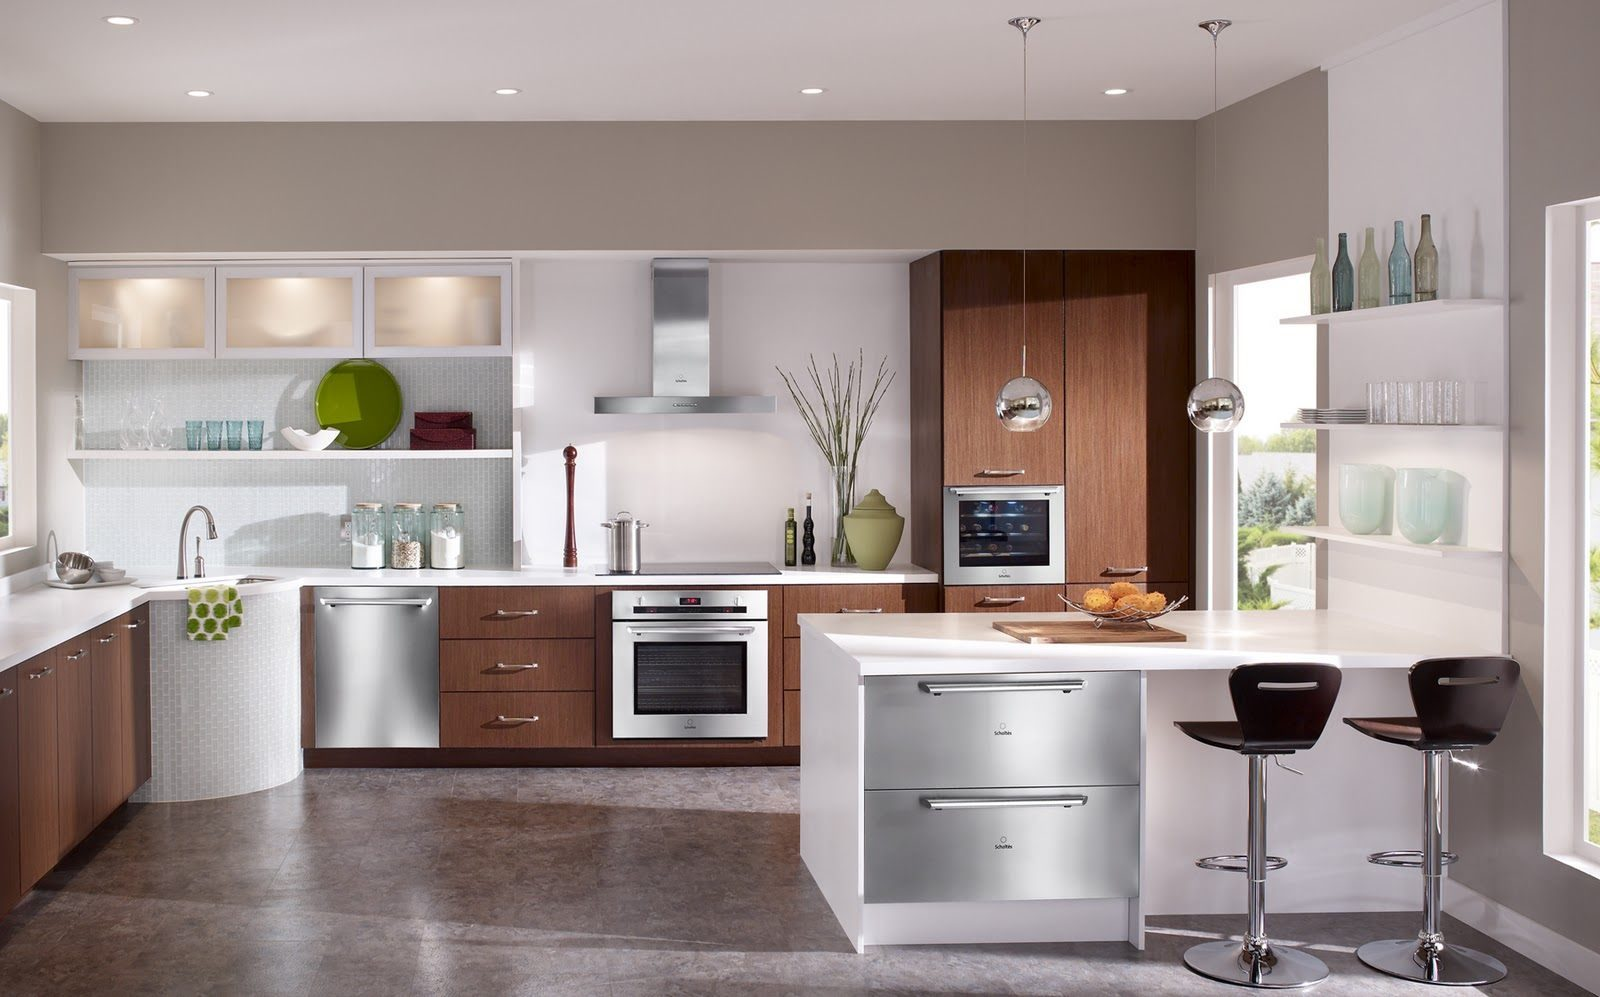 Escoger electrodom sticos de cocina for Modelos de cocinas modernas americanas